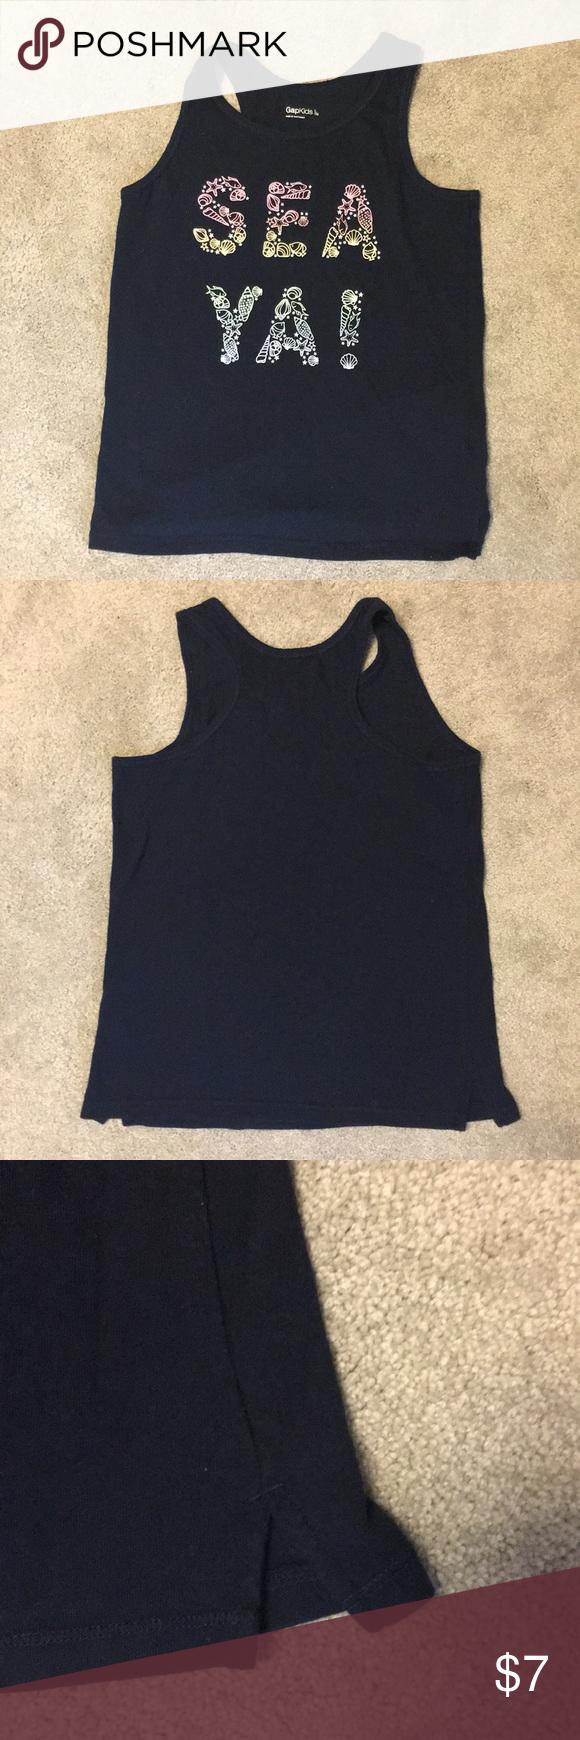 New Kids Gap Size L Girls Tank Tops Shirts White